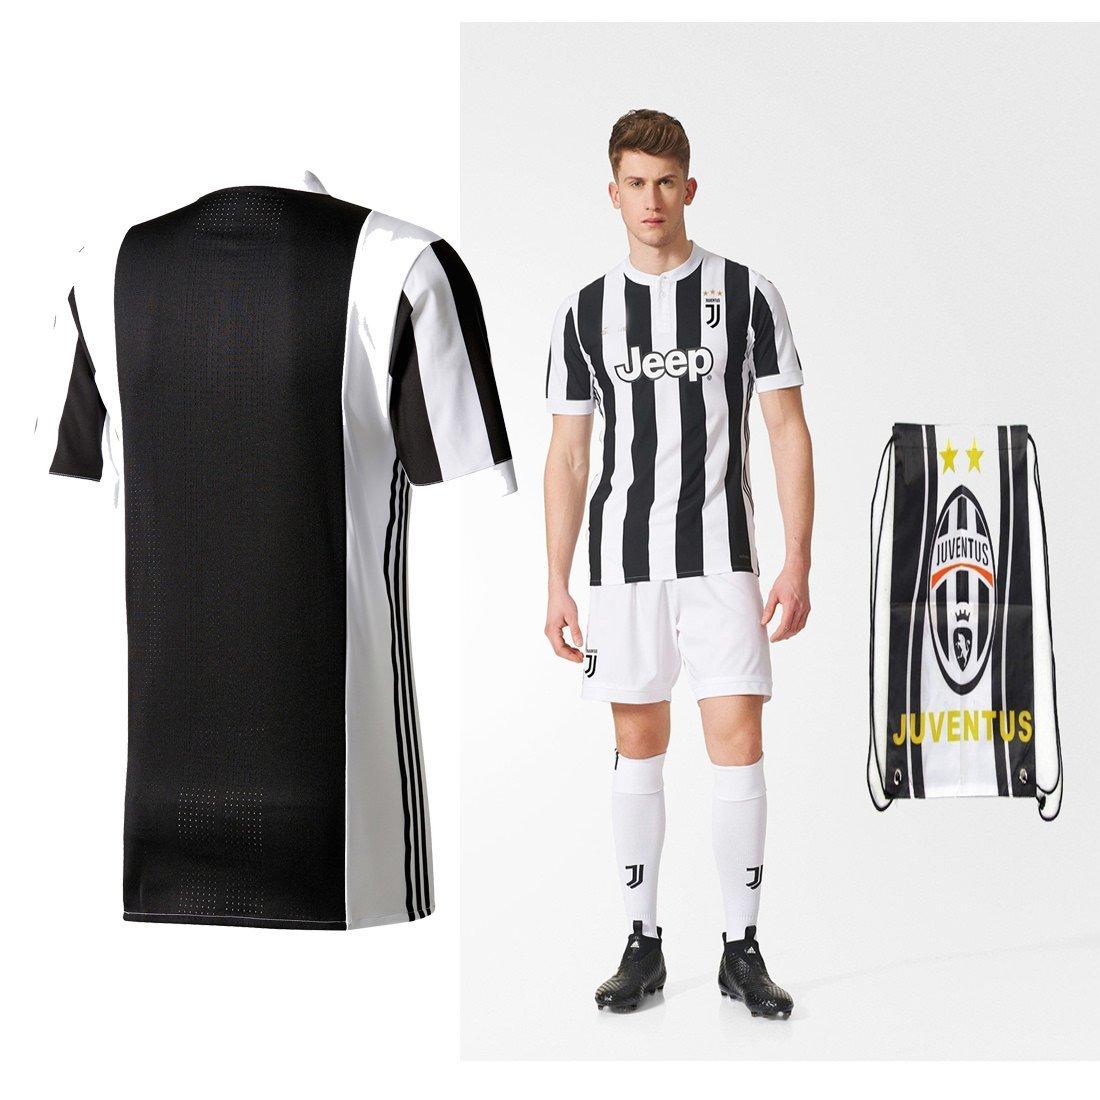 Juventus Paulo Dybala Higuan 2017 2018 17 18 Kid Youth Ages 4 to 12 Yrs Old Home Replica Jersey Kids Kit : Shirt, Short, Socks, Bag